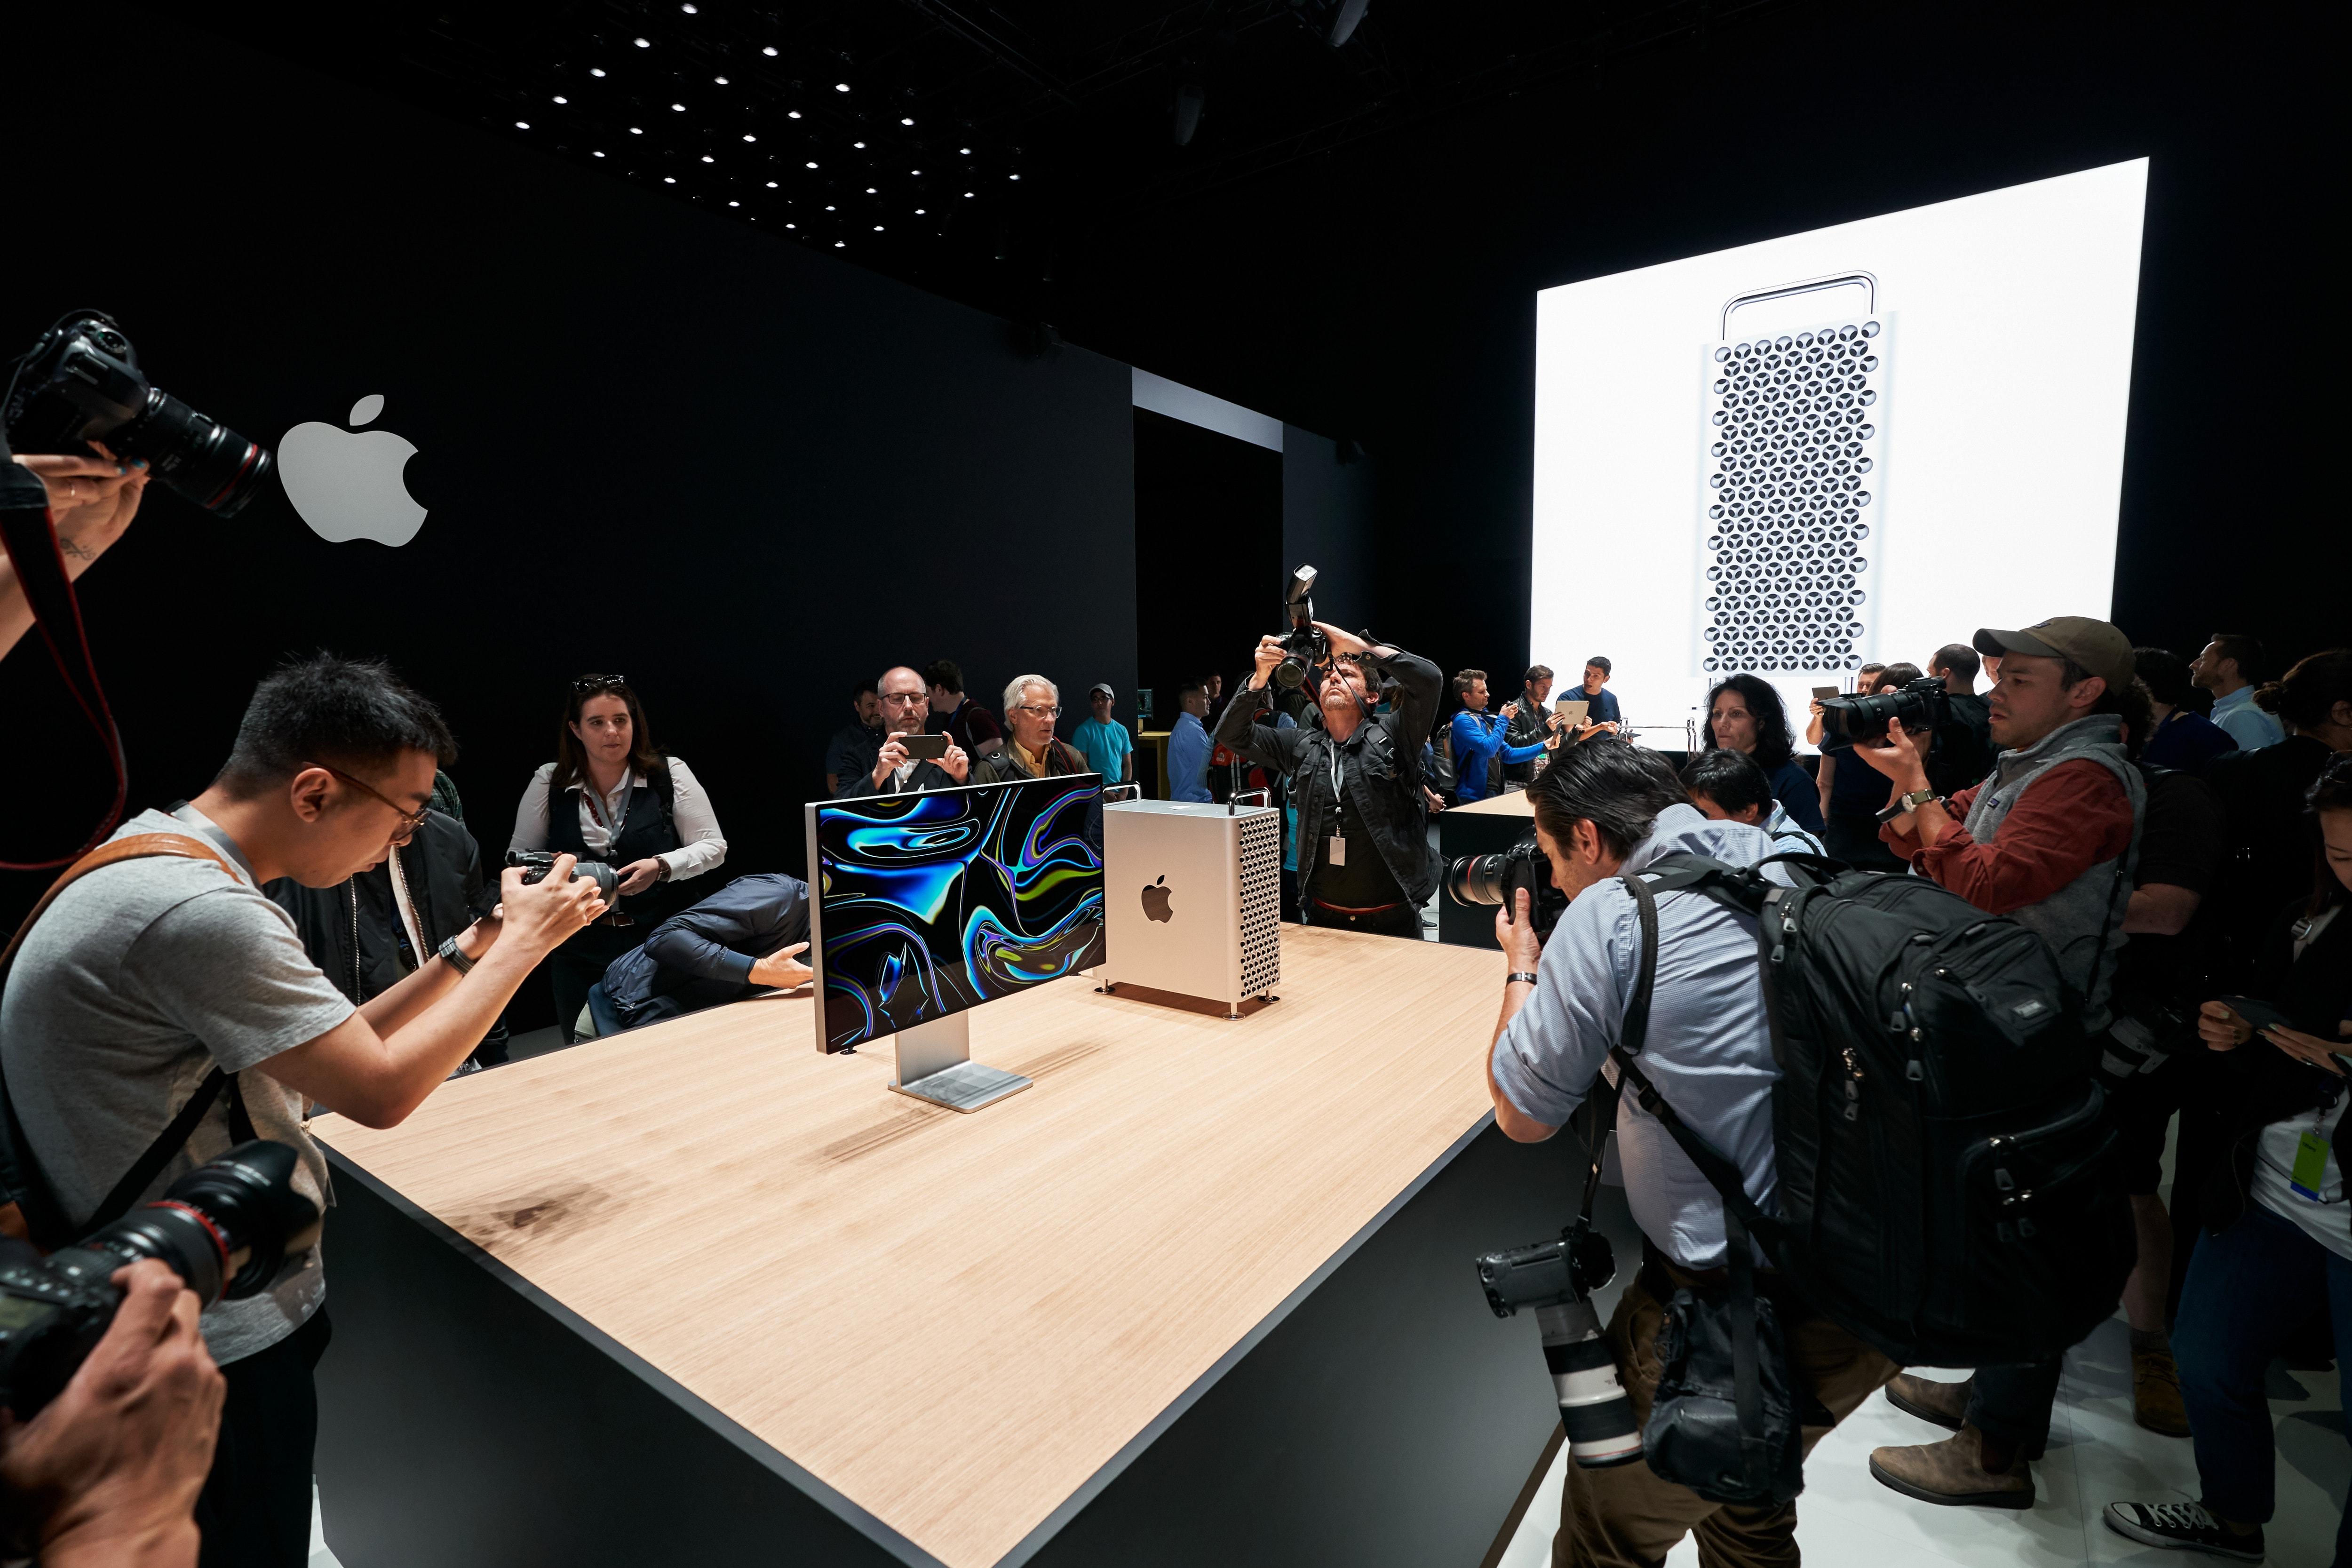 Jornalistas fotografando o novo Mac Pro com o Apple Pro Display XDR na WWDC19